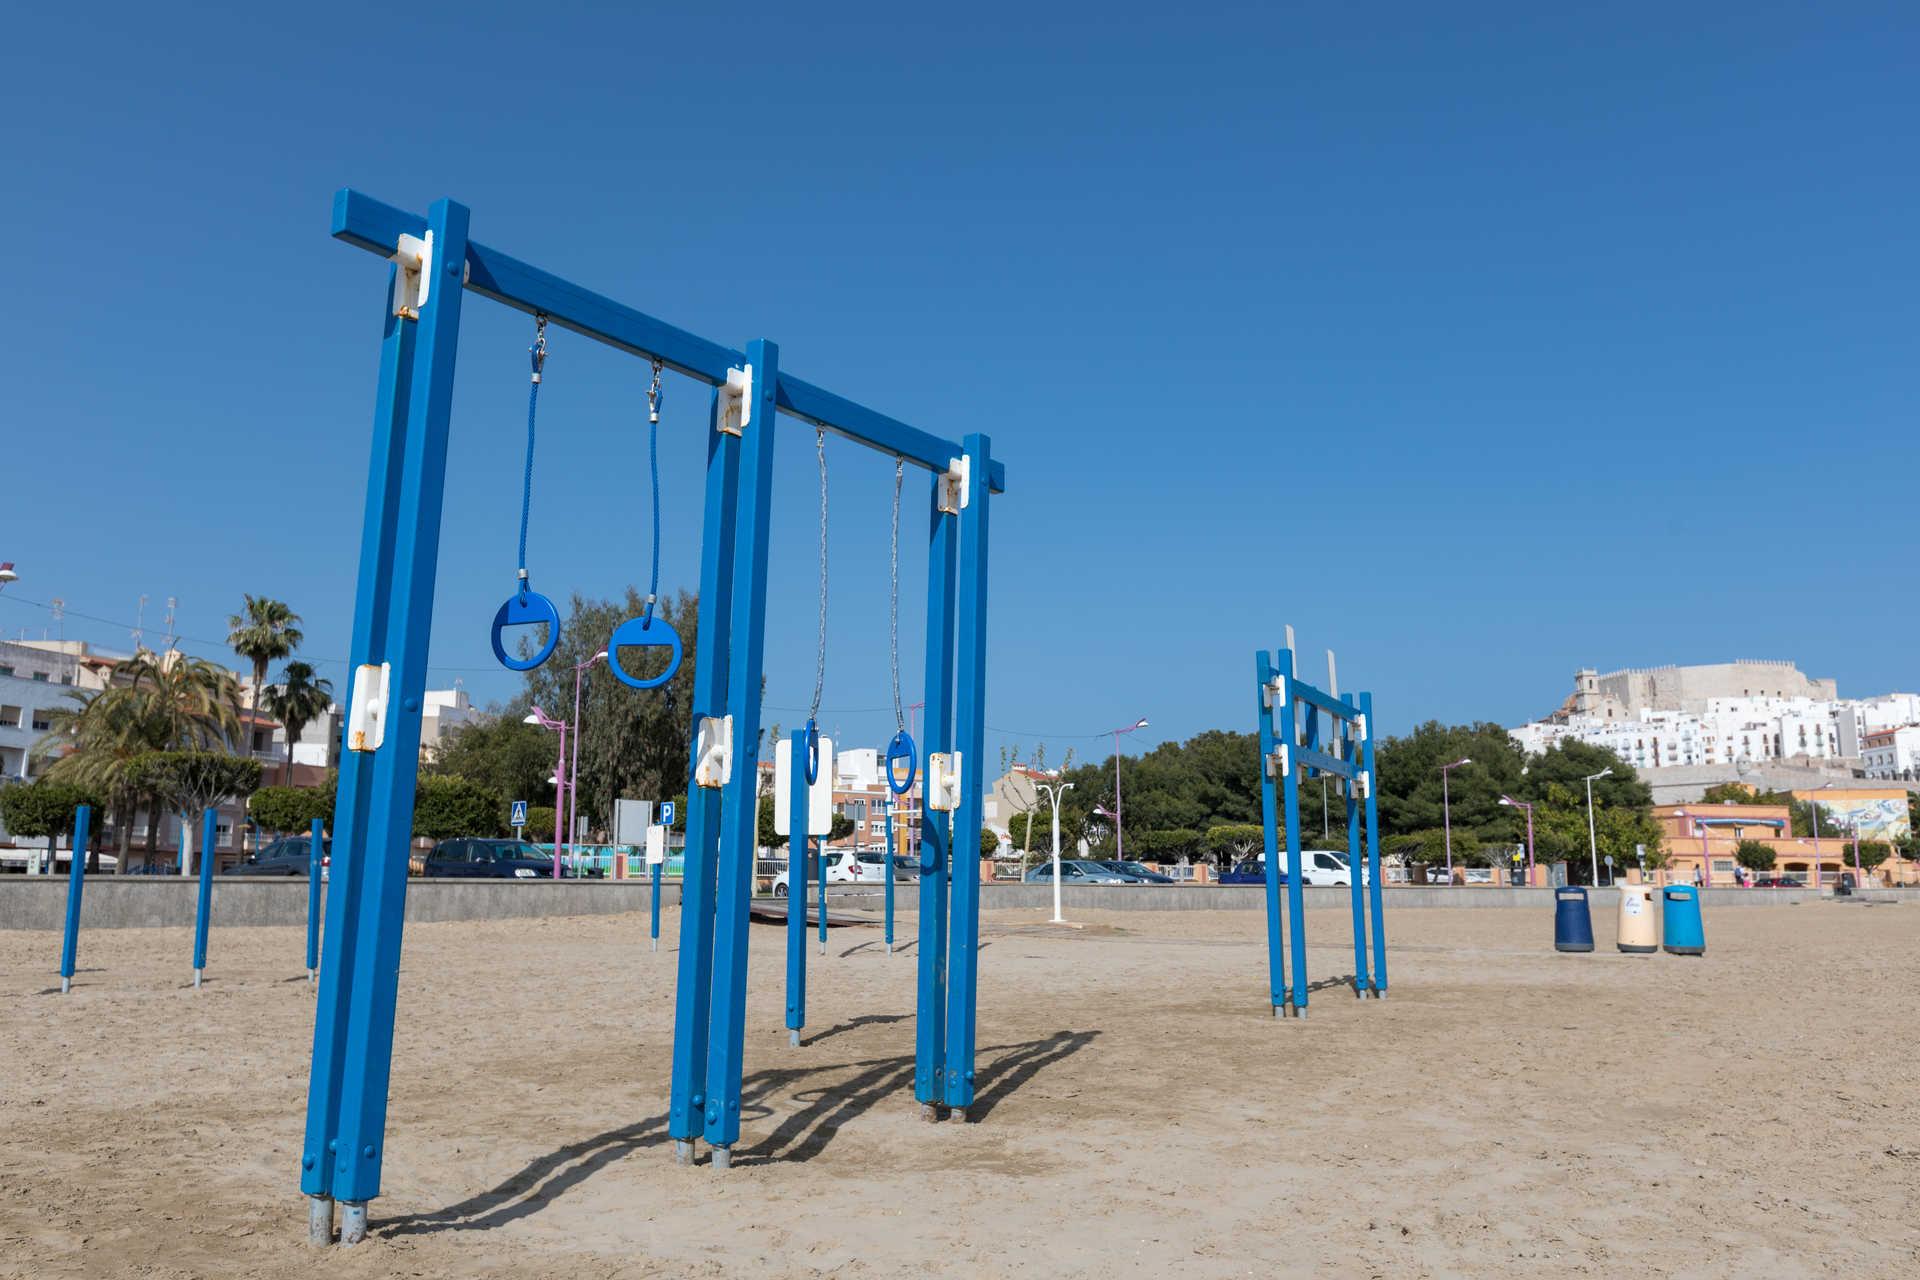 Playa Sud